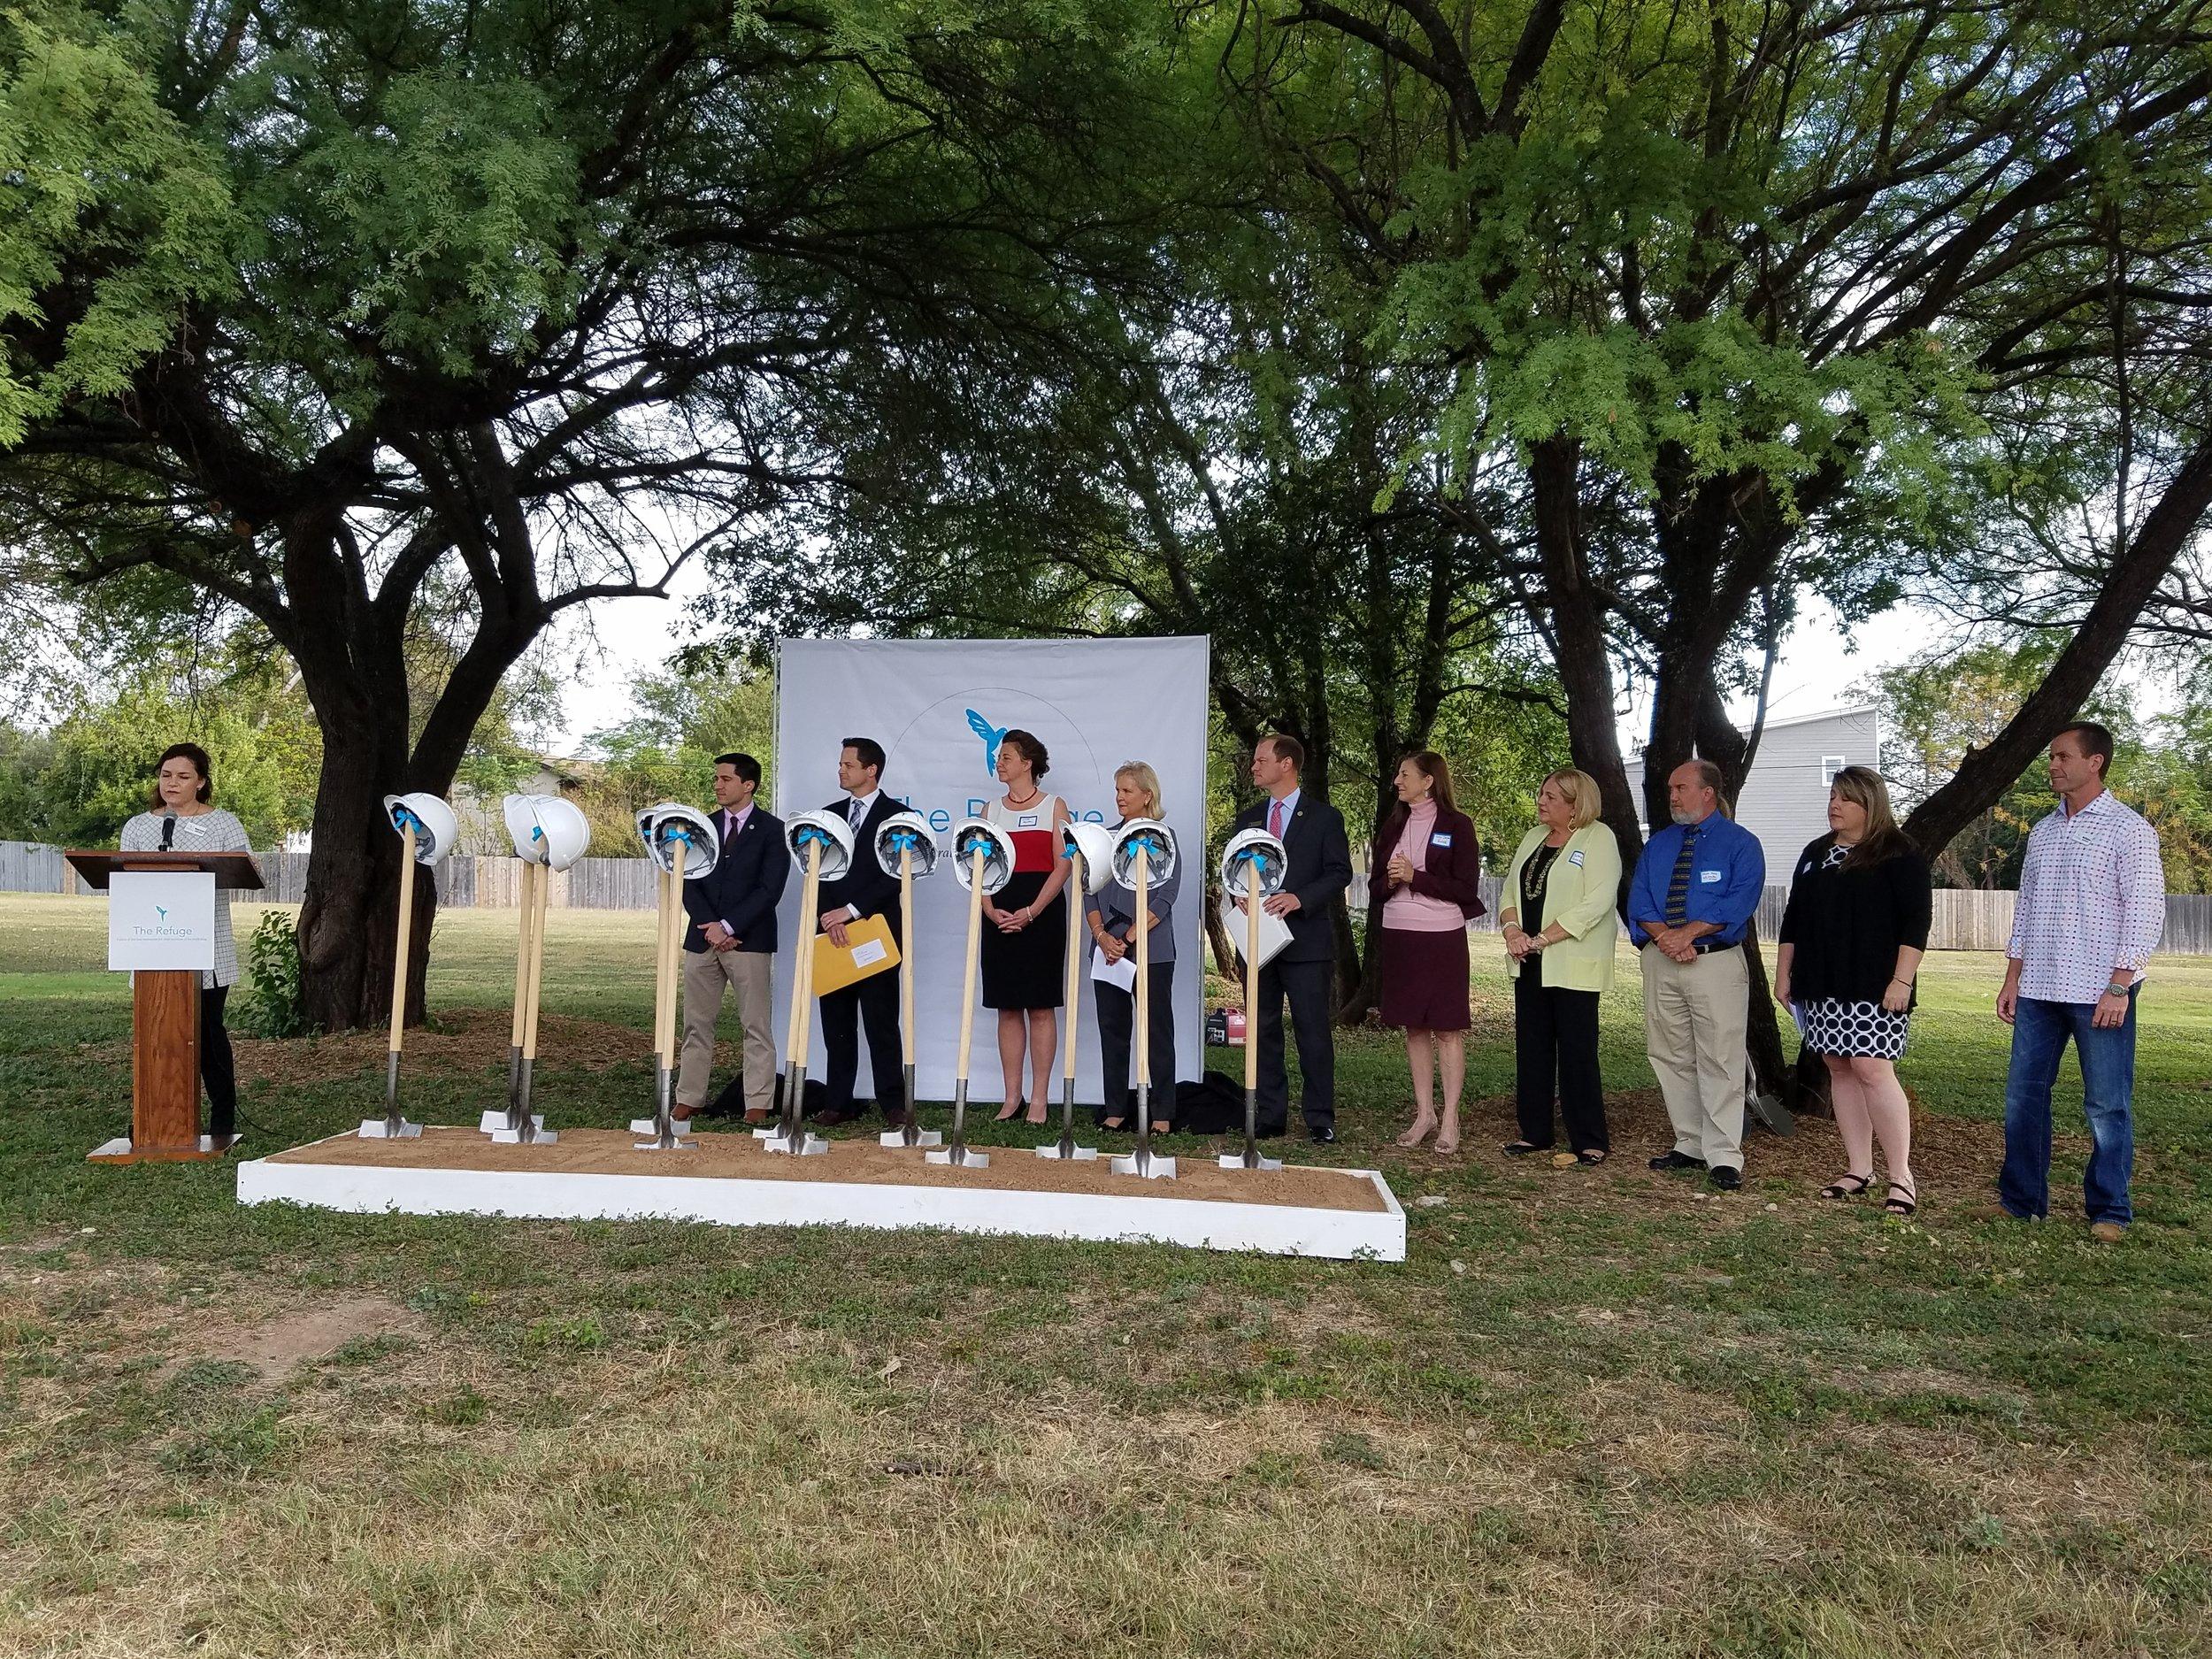 Ceremonial Groundbreaking for The Refuge Ranch, October 25, 2016